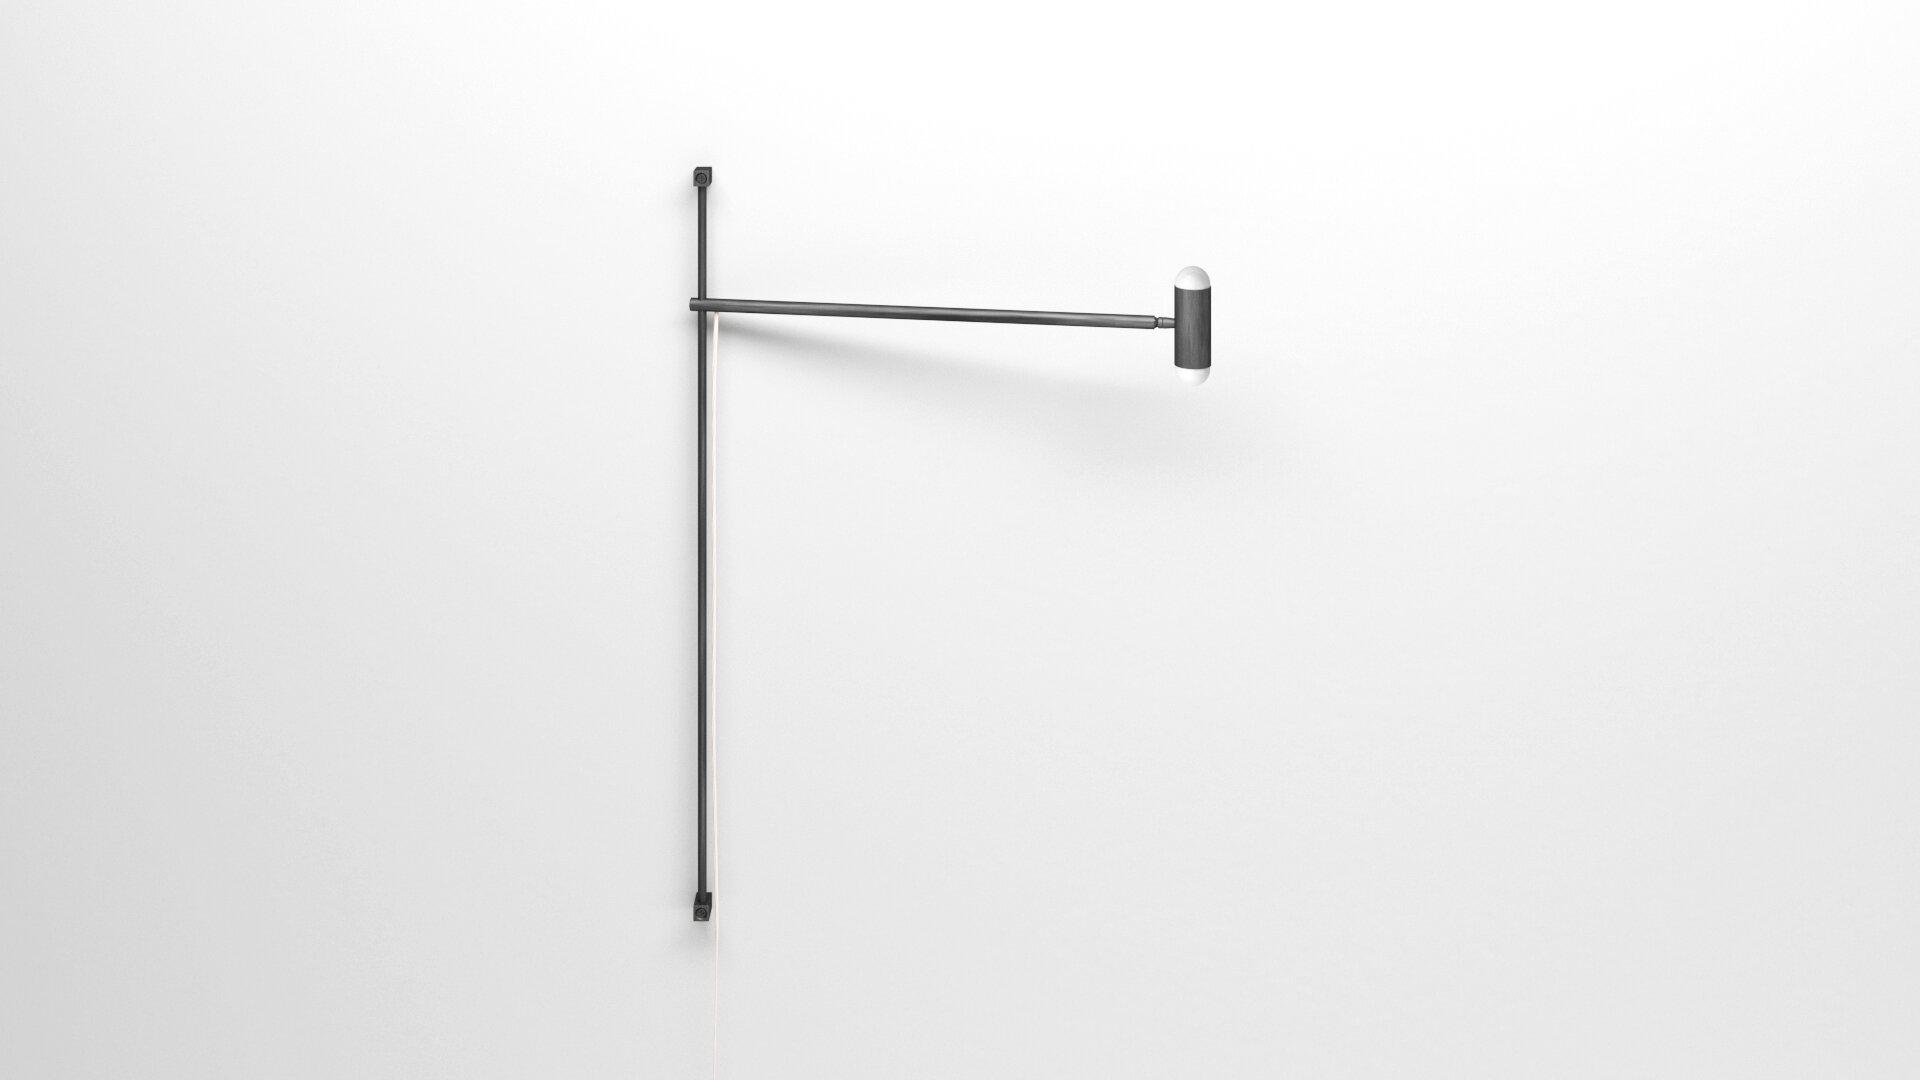 Olivr_Studio_Swing_Arm_Lamp1.jpg